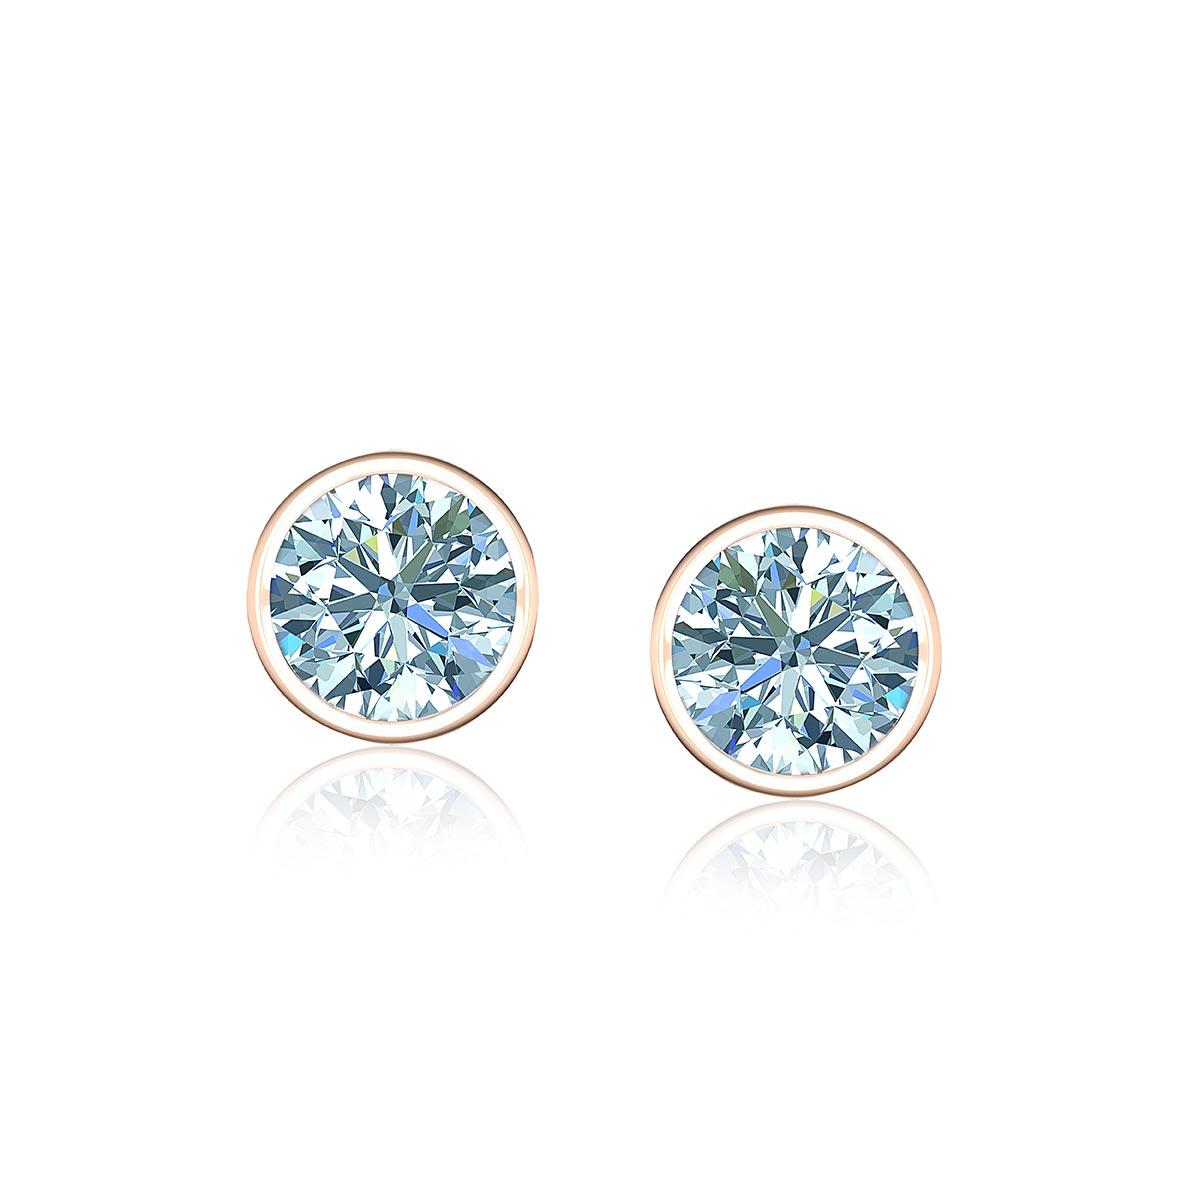 Ara Diamond Earrings (1 CT. TW.)